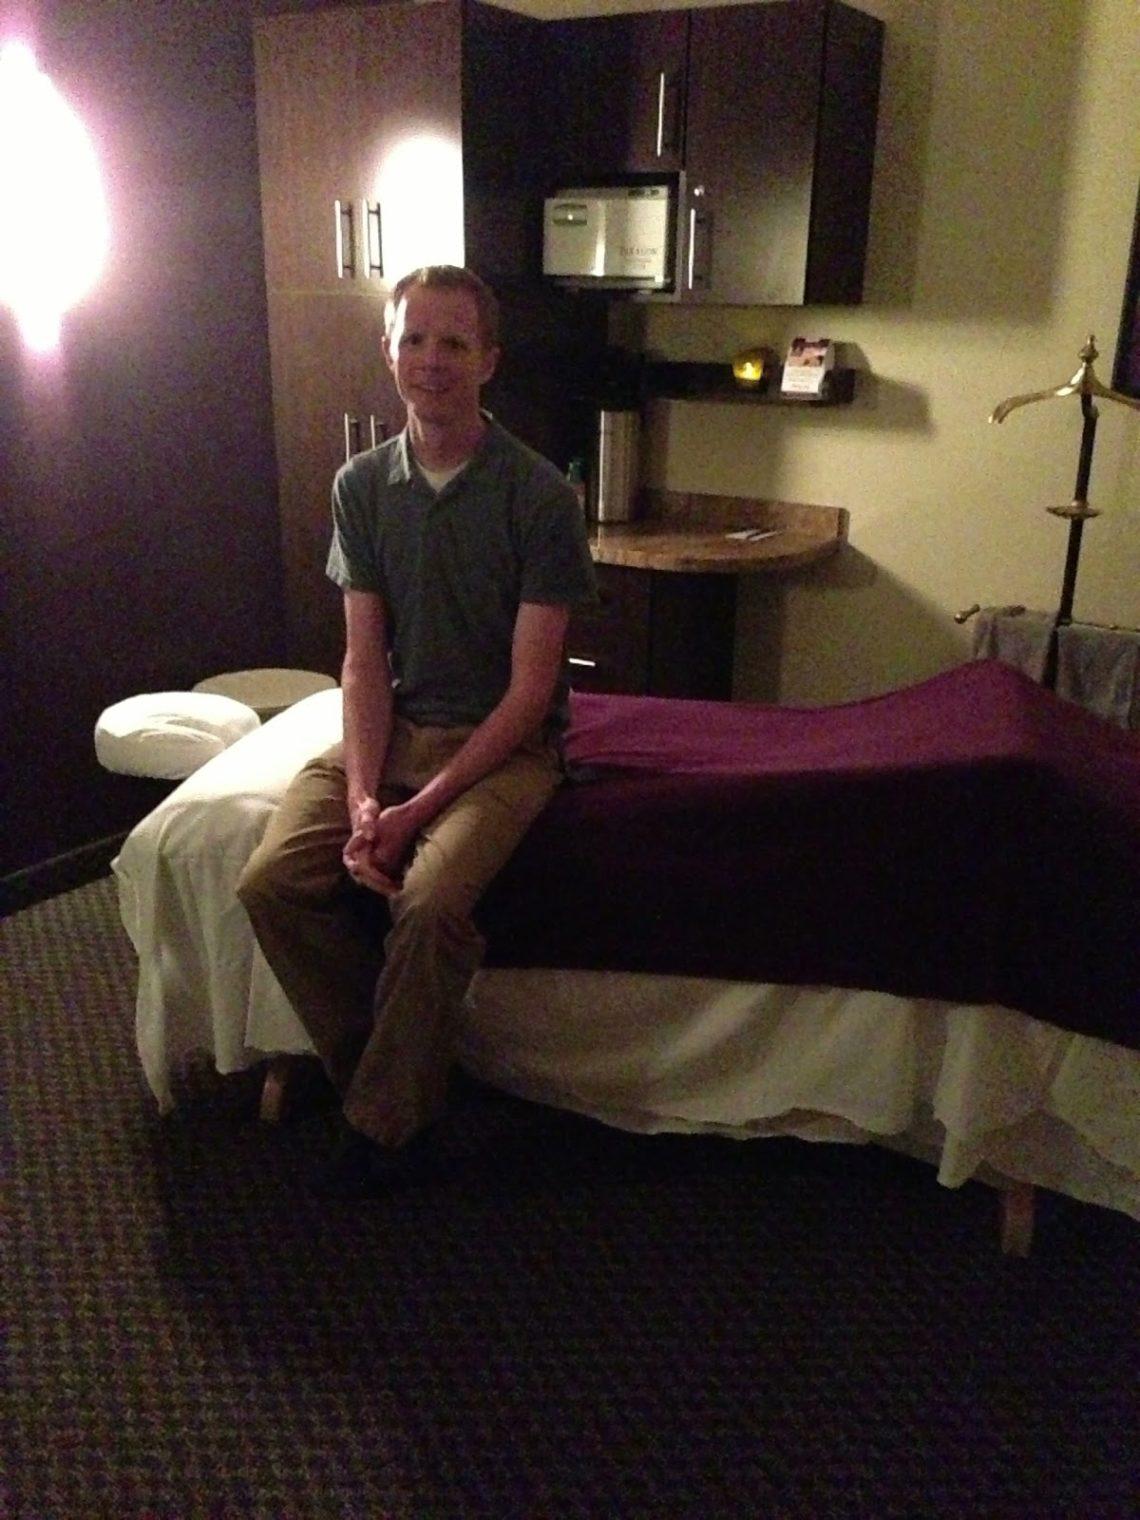 massage oslo dating in the dark